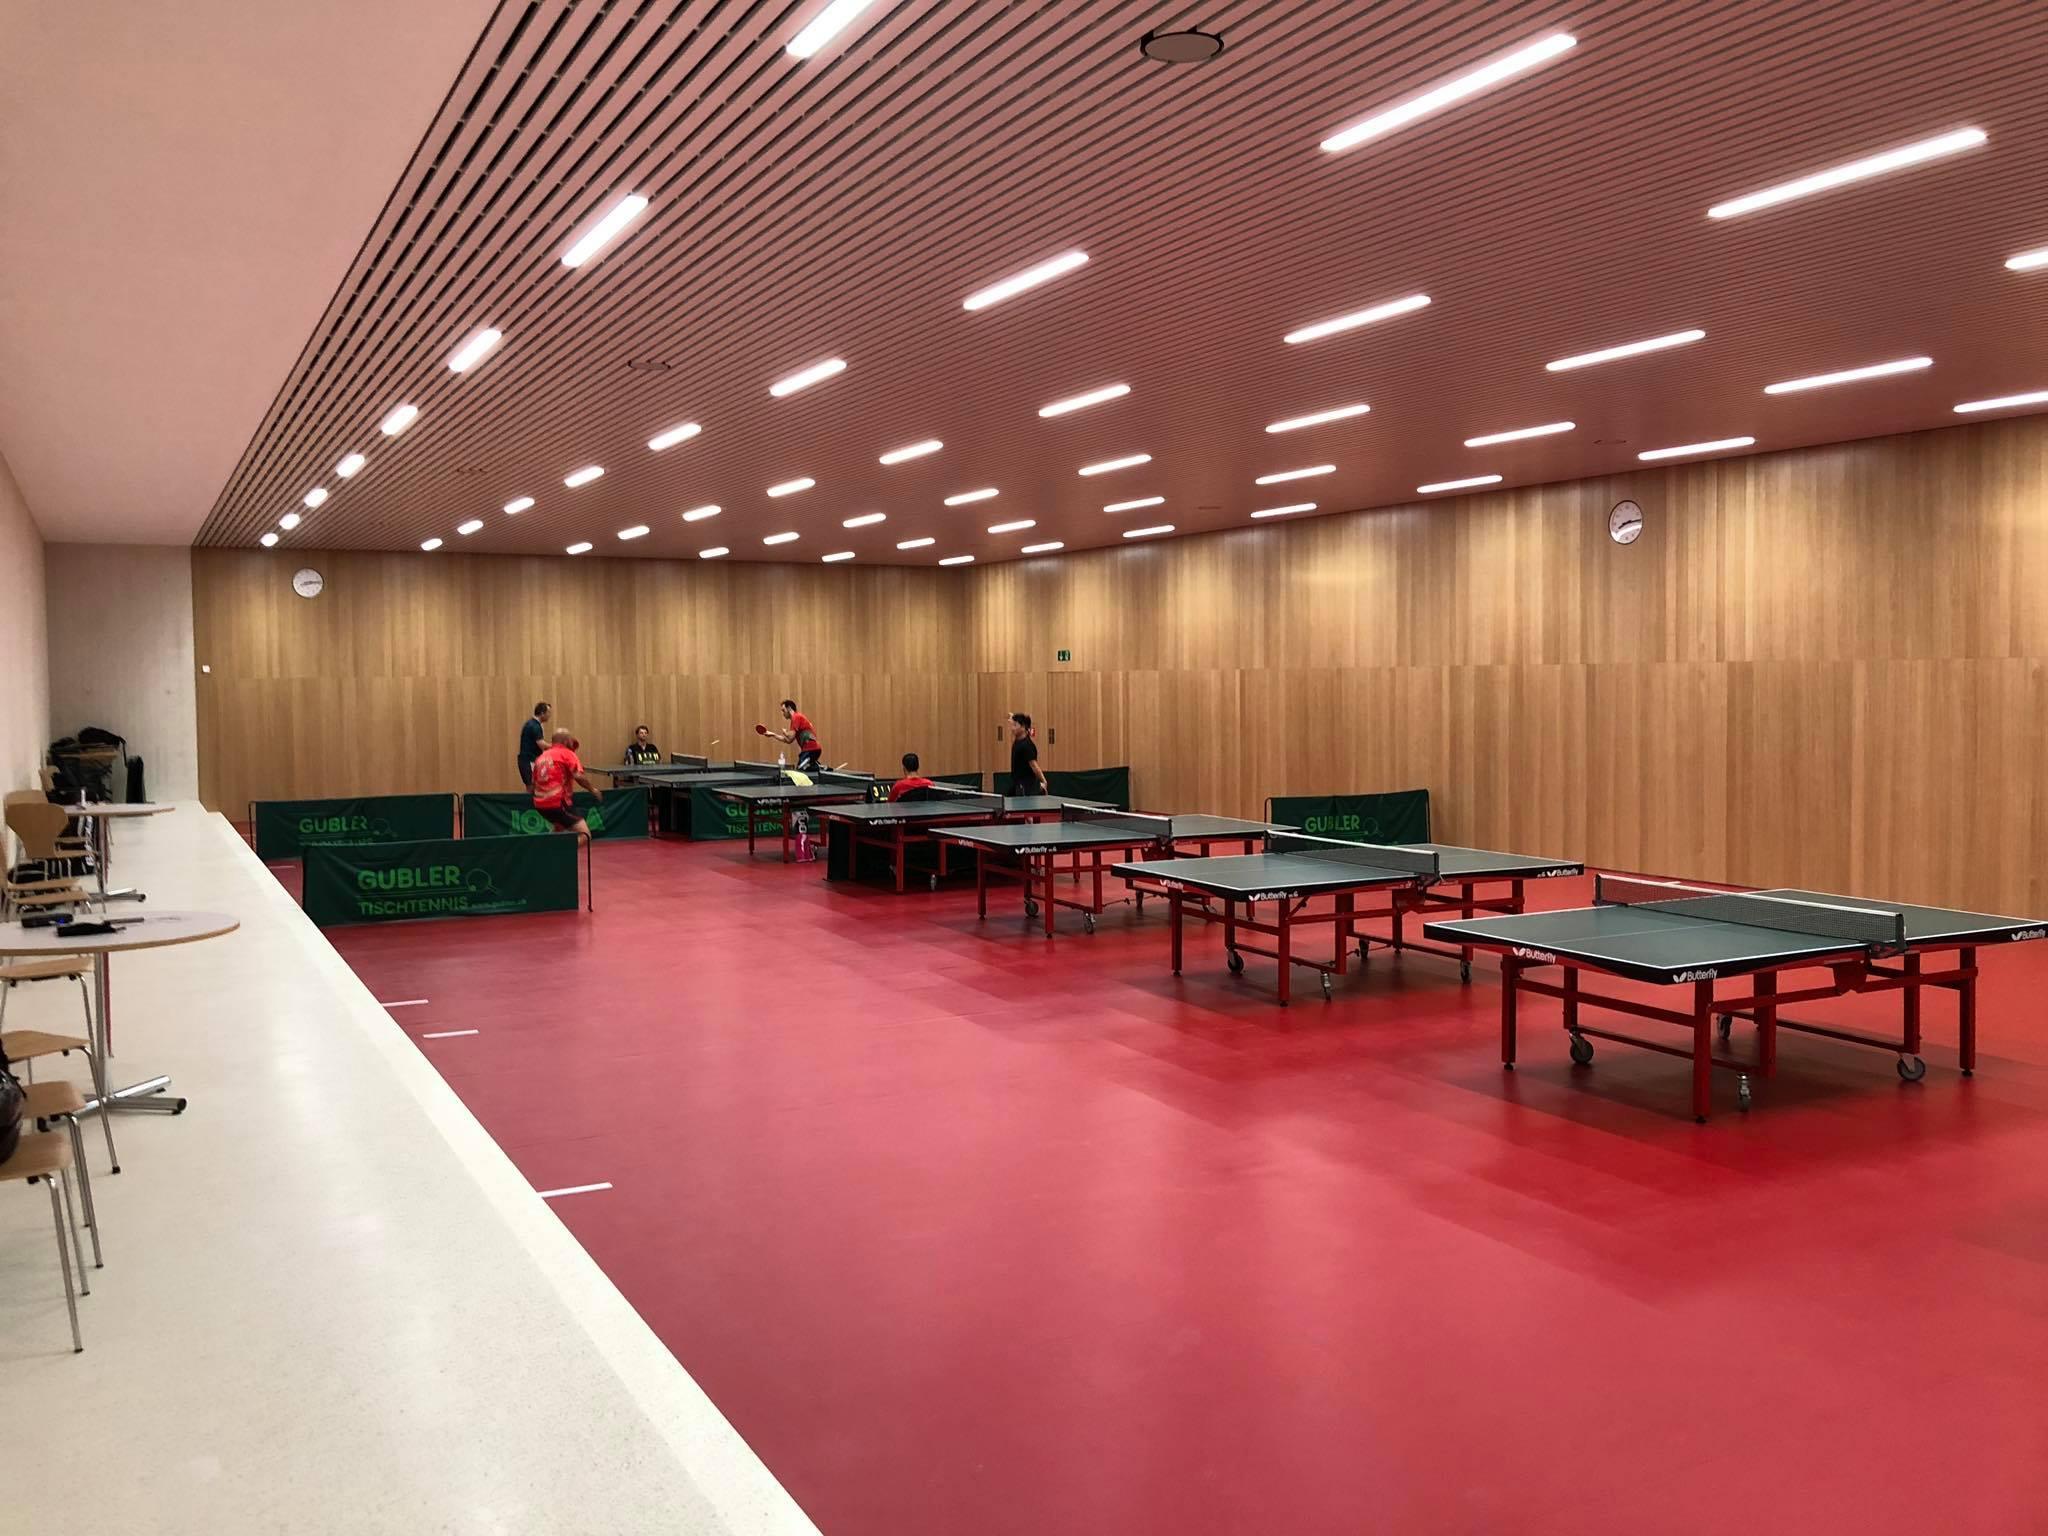 Salle match - Facebook